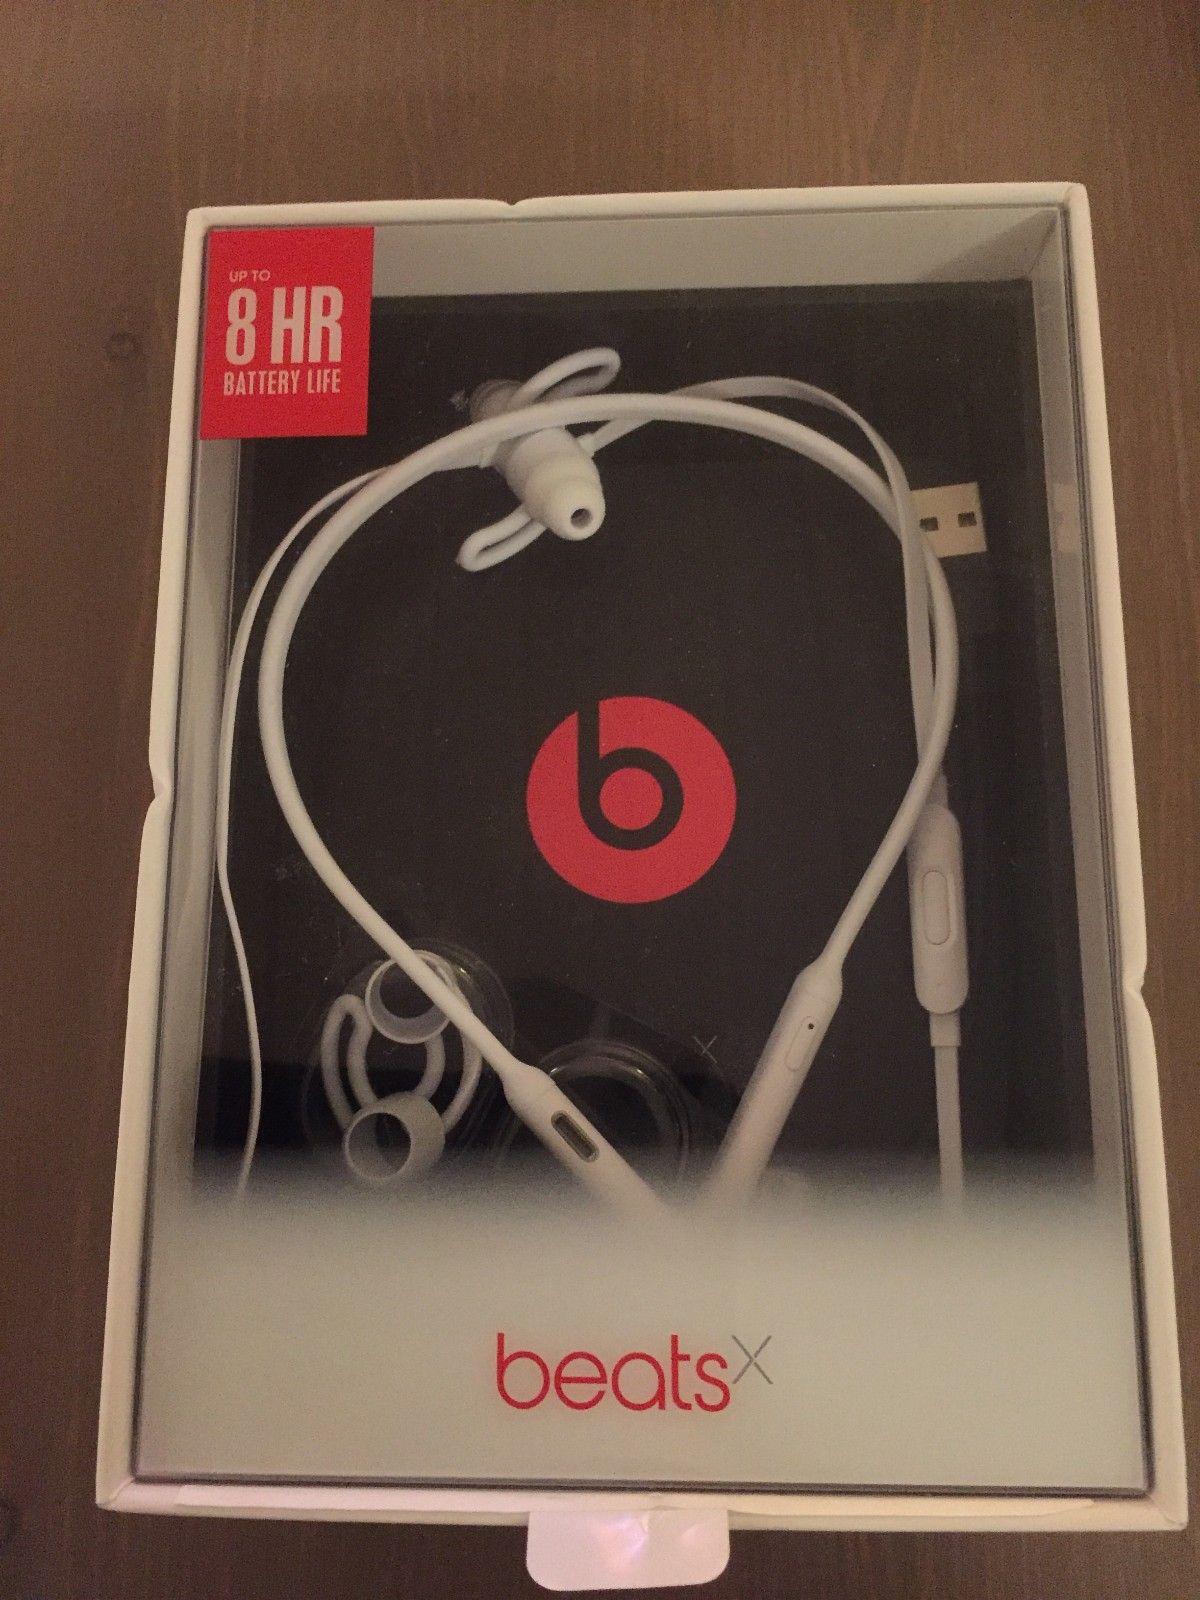 Beats X trådløse øretelefoner - Råholt  - Beats X trådløse øretelefoner selges. Brukt kun en gang. Kjøpt i 31/7-17, har kvittering. Nypris 1166,-, selges kr 700,- - Råholt